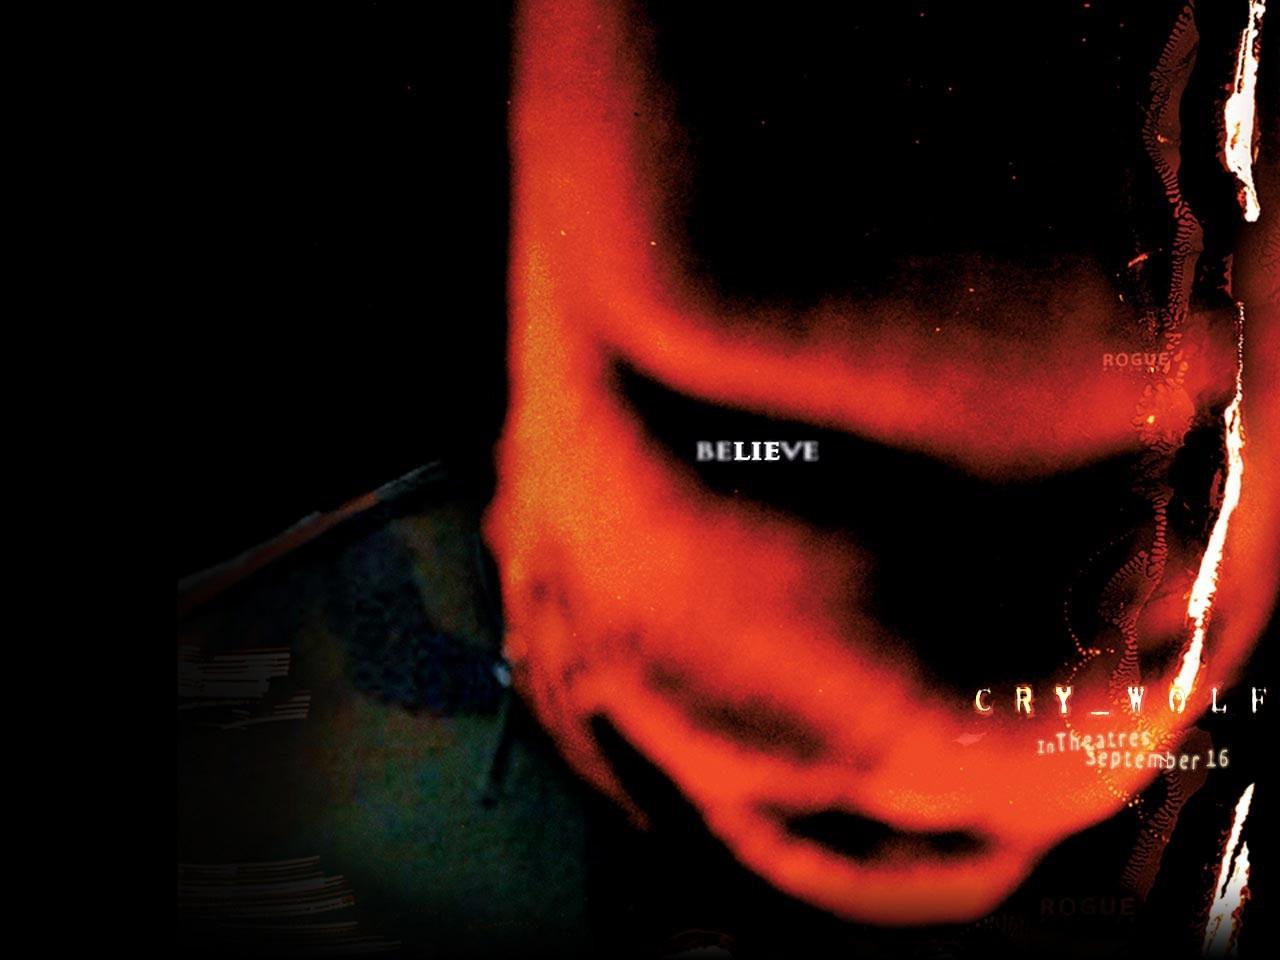 Wallpaper del film Nickname: l'enigmista (Cry Wolf)